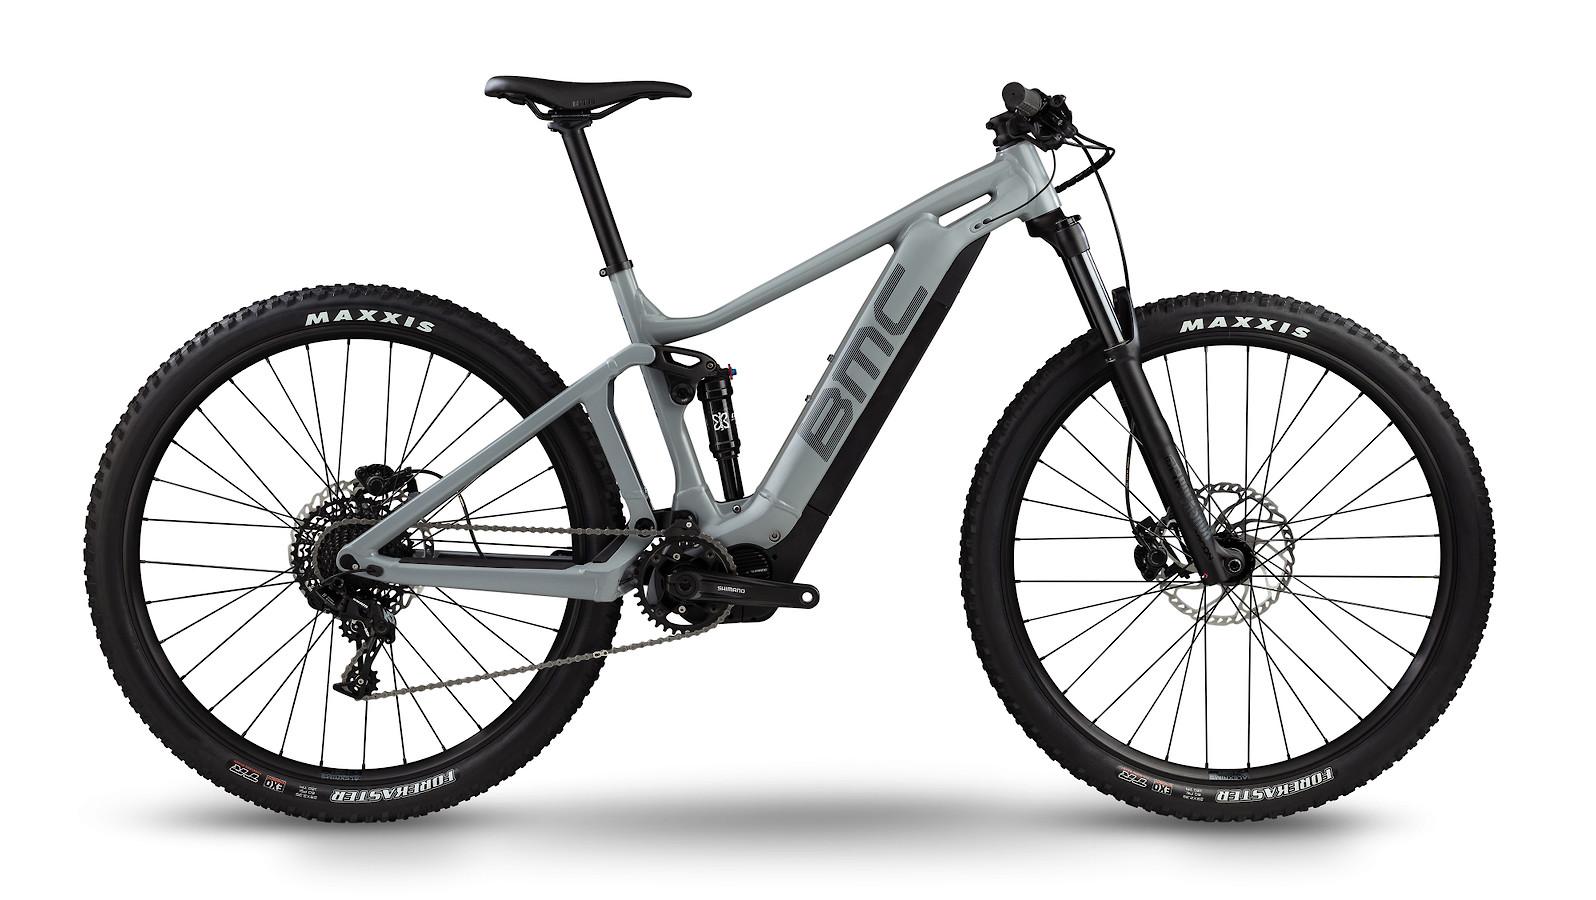 2019 BMC Speedfox AMP Five E-bike in Grey